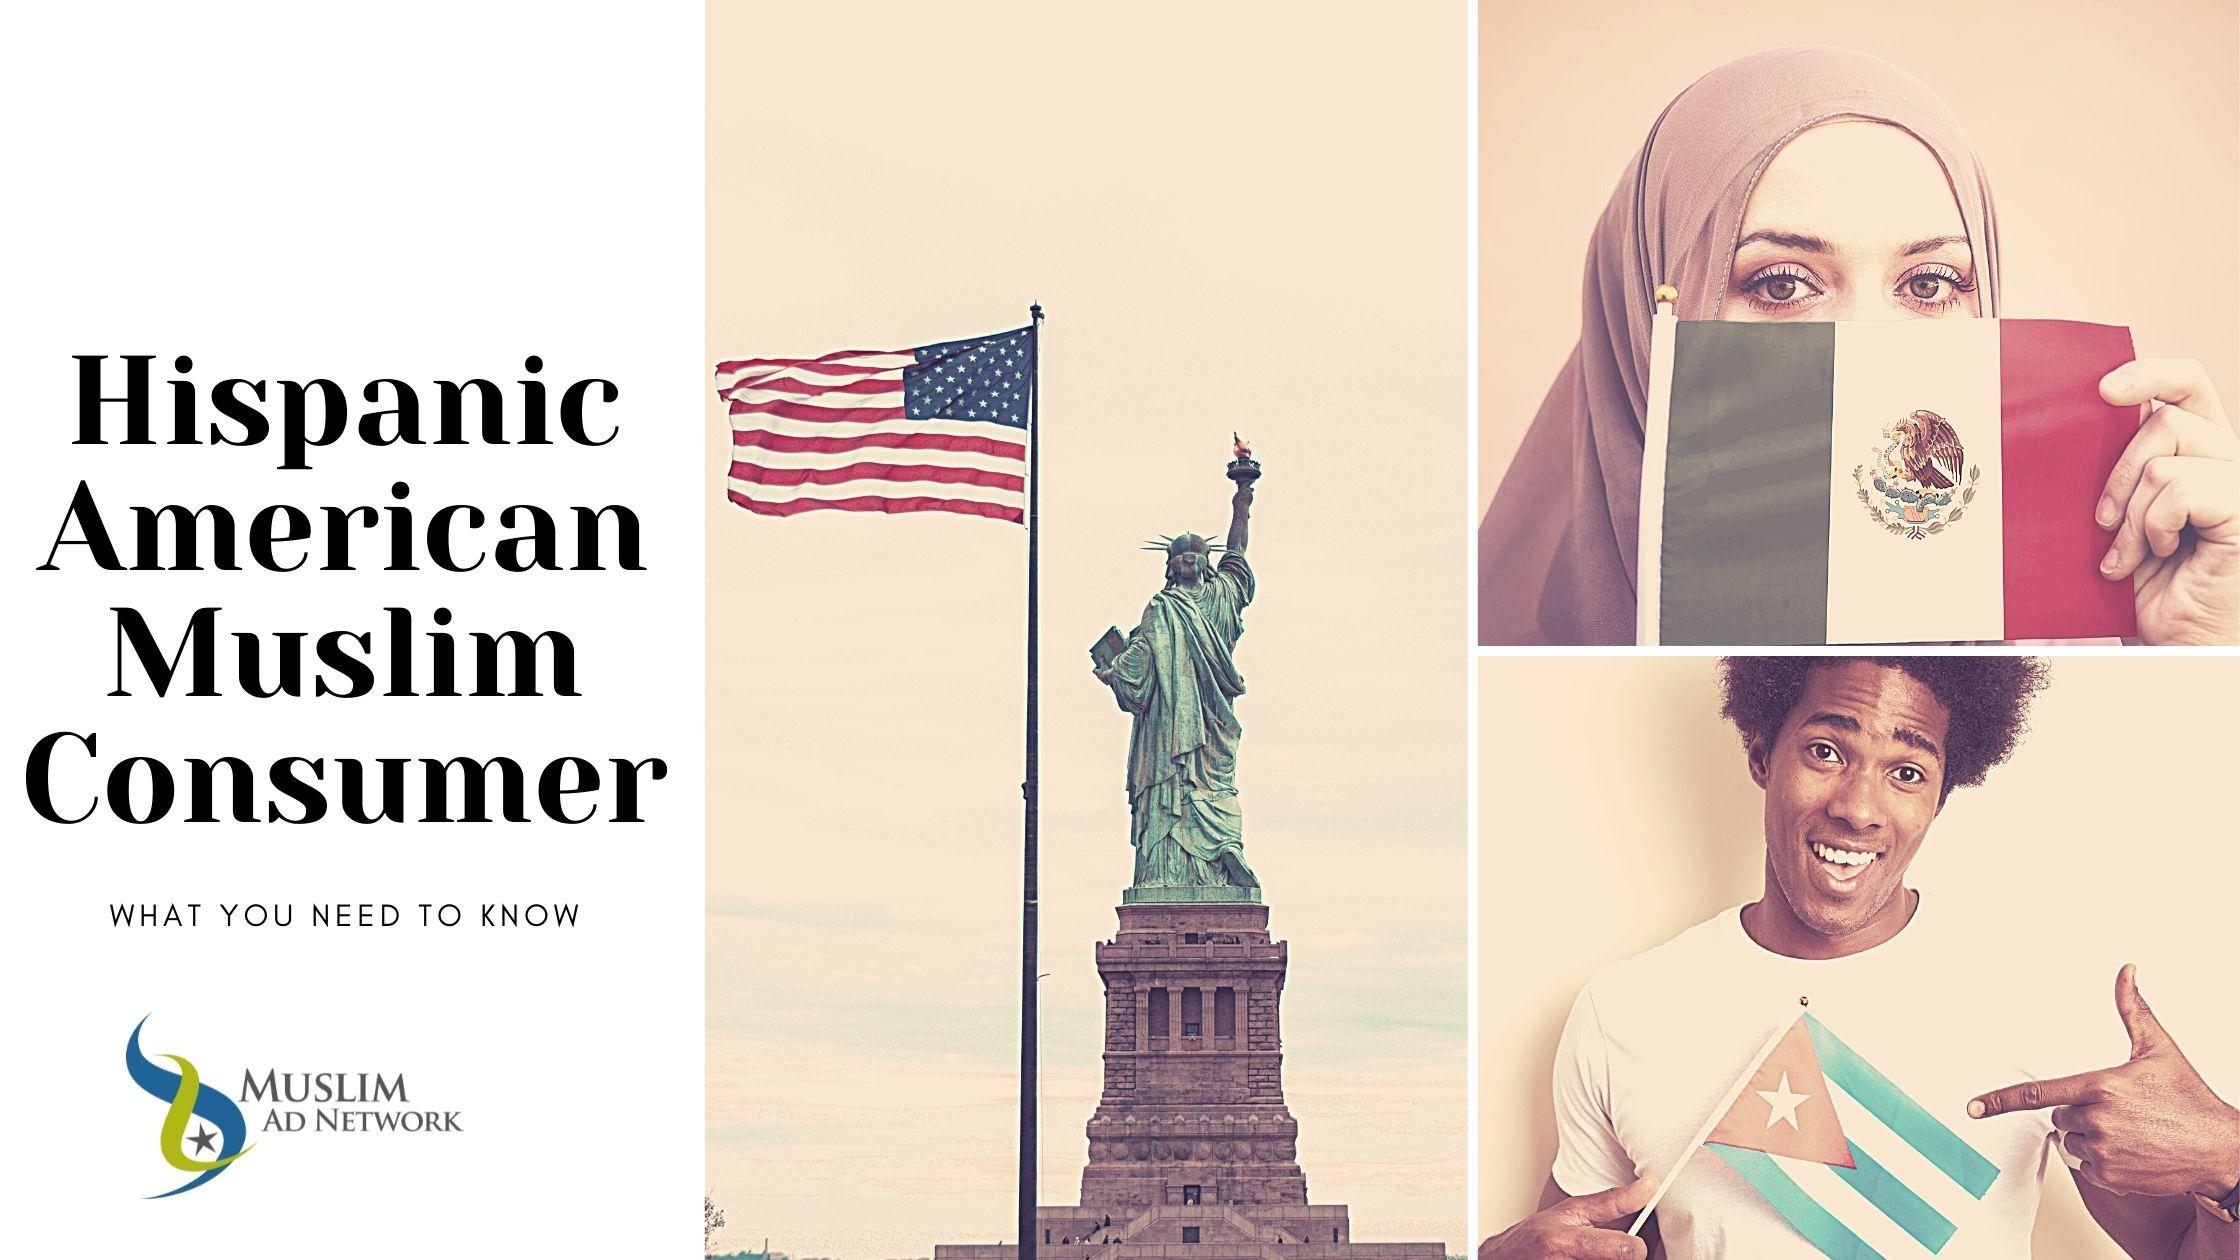 hispanic american muslim